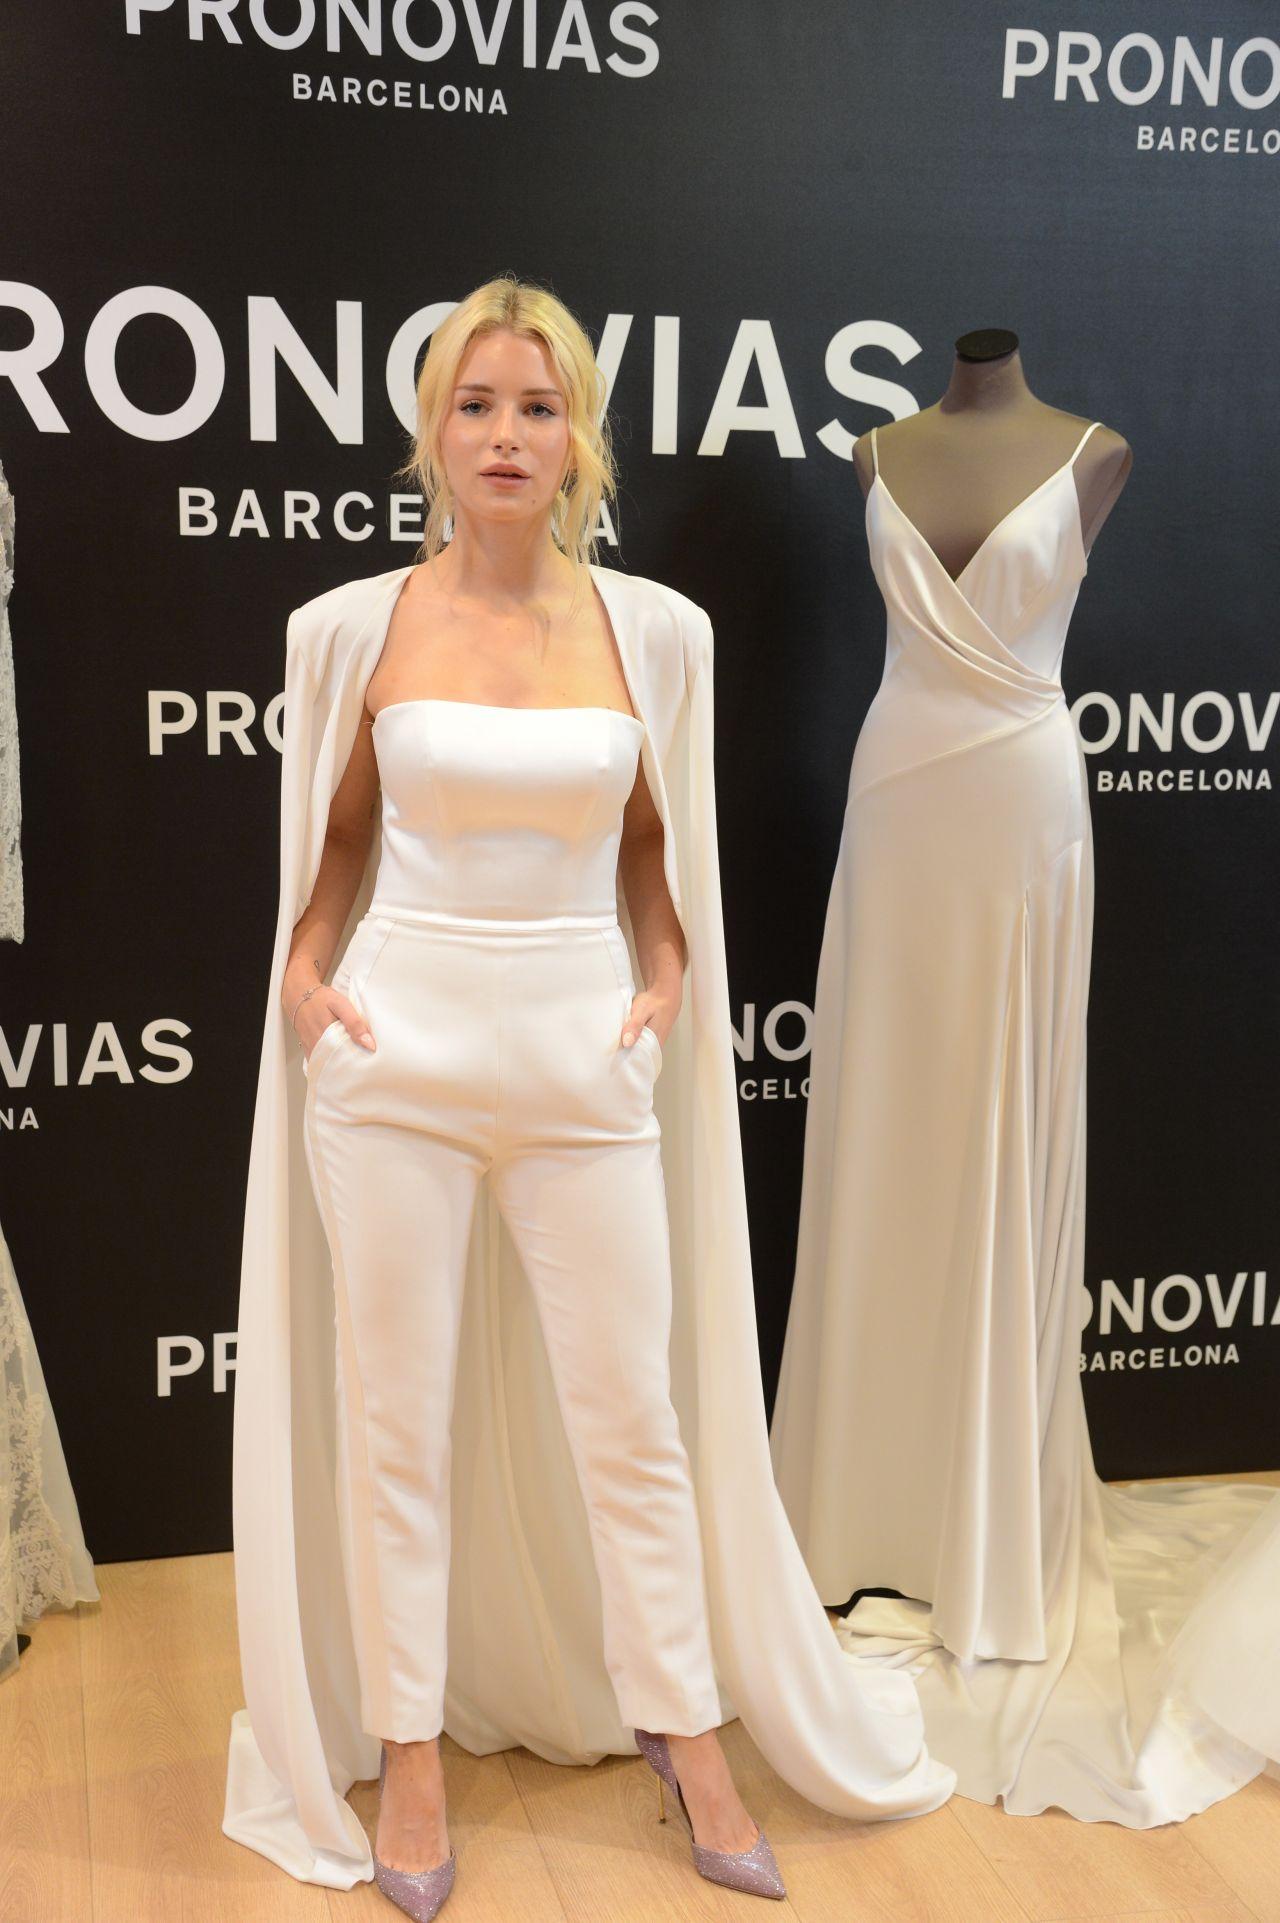 4f44a9ba26c13 Lottie Moss - Pronovias Event at the Barcelona Bridal Week 04/25/2019